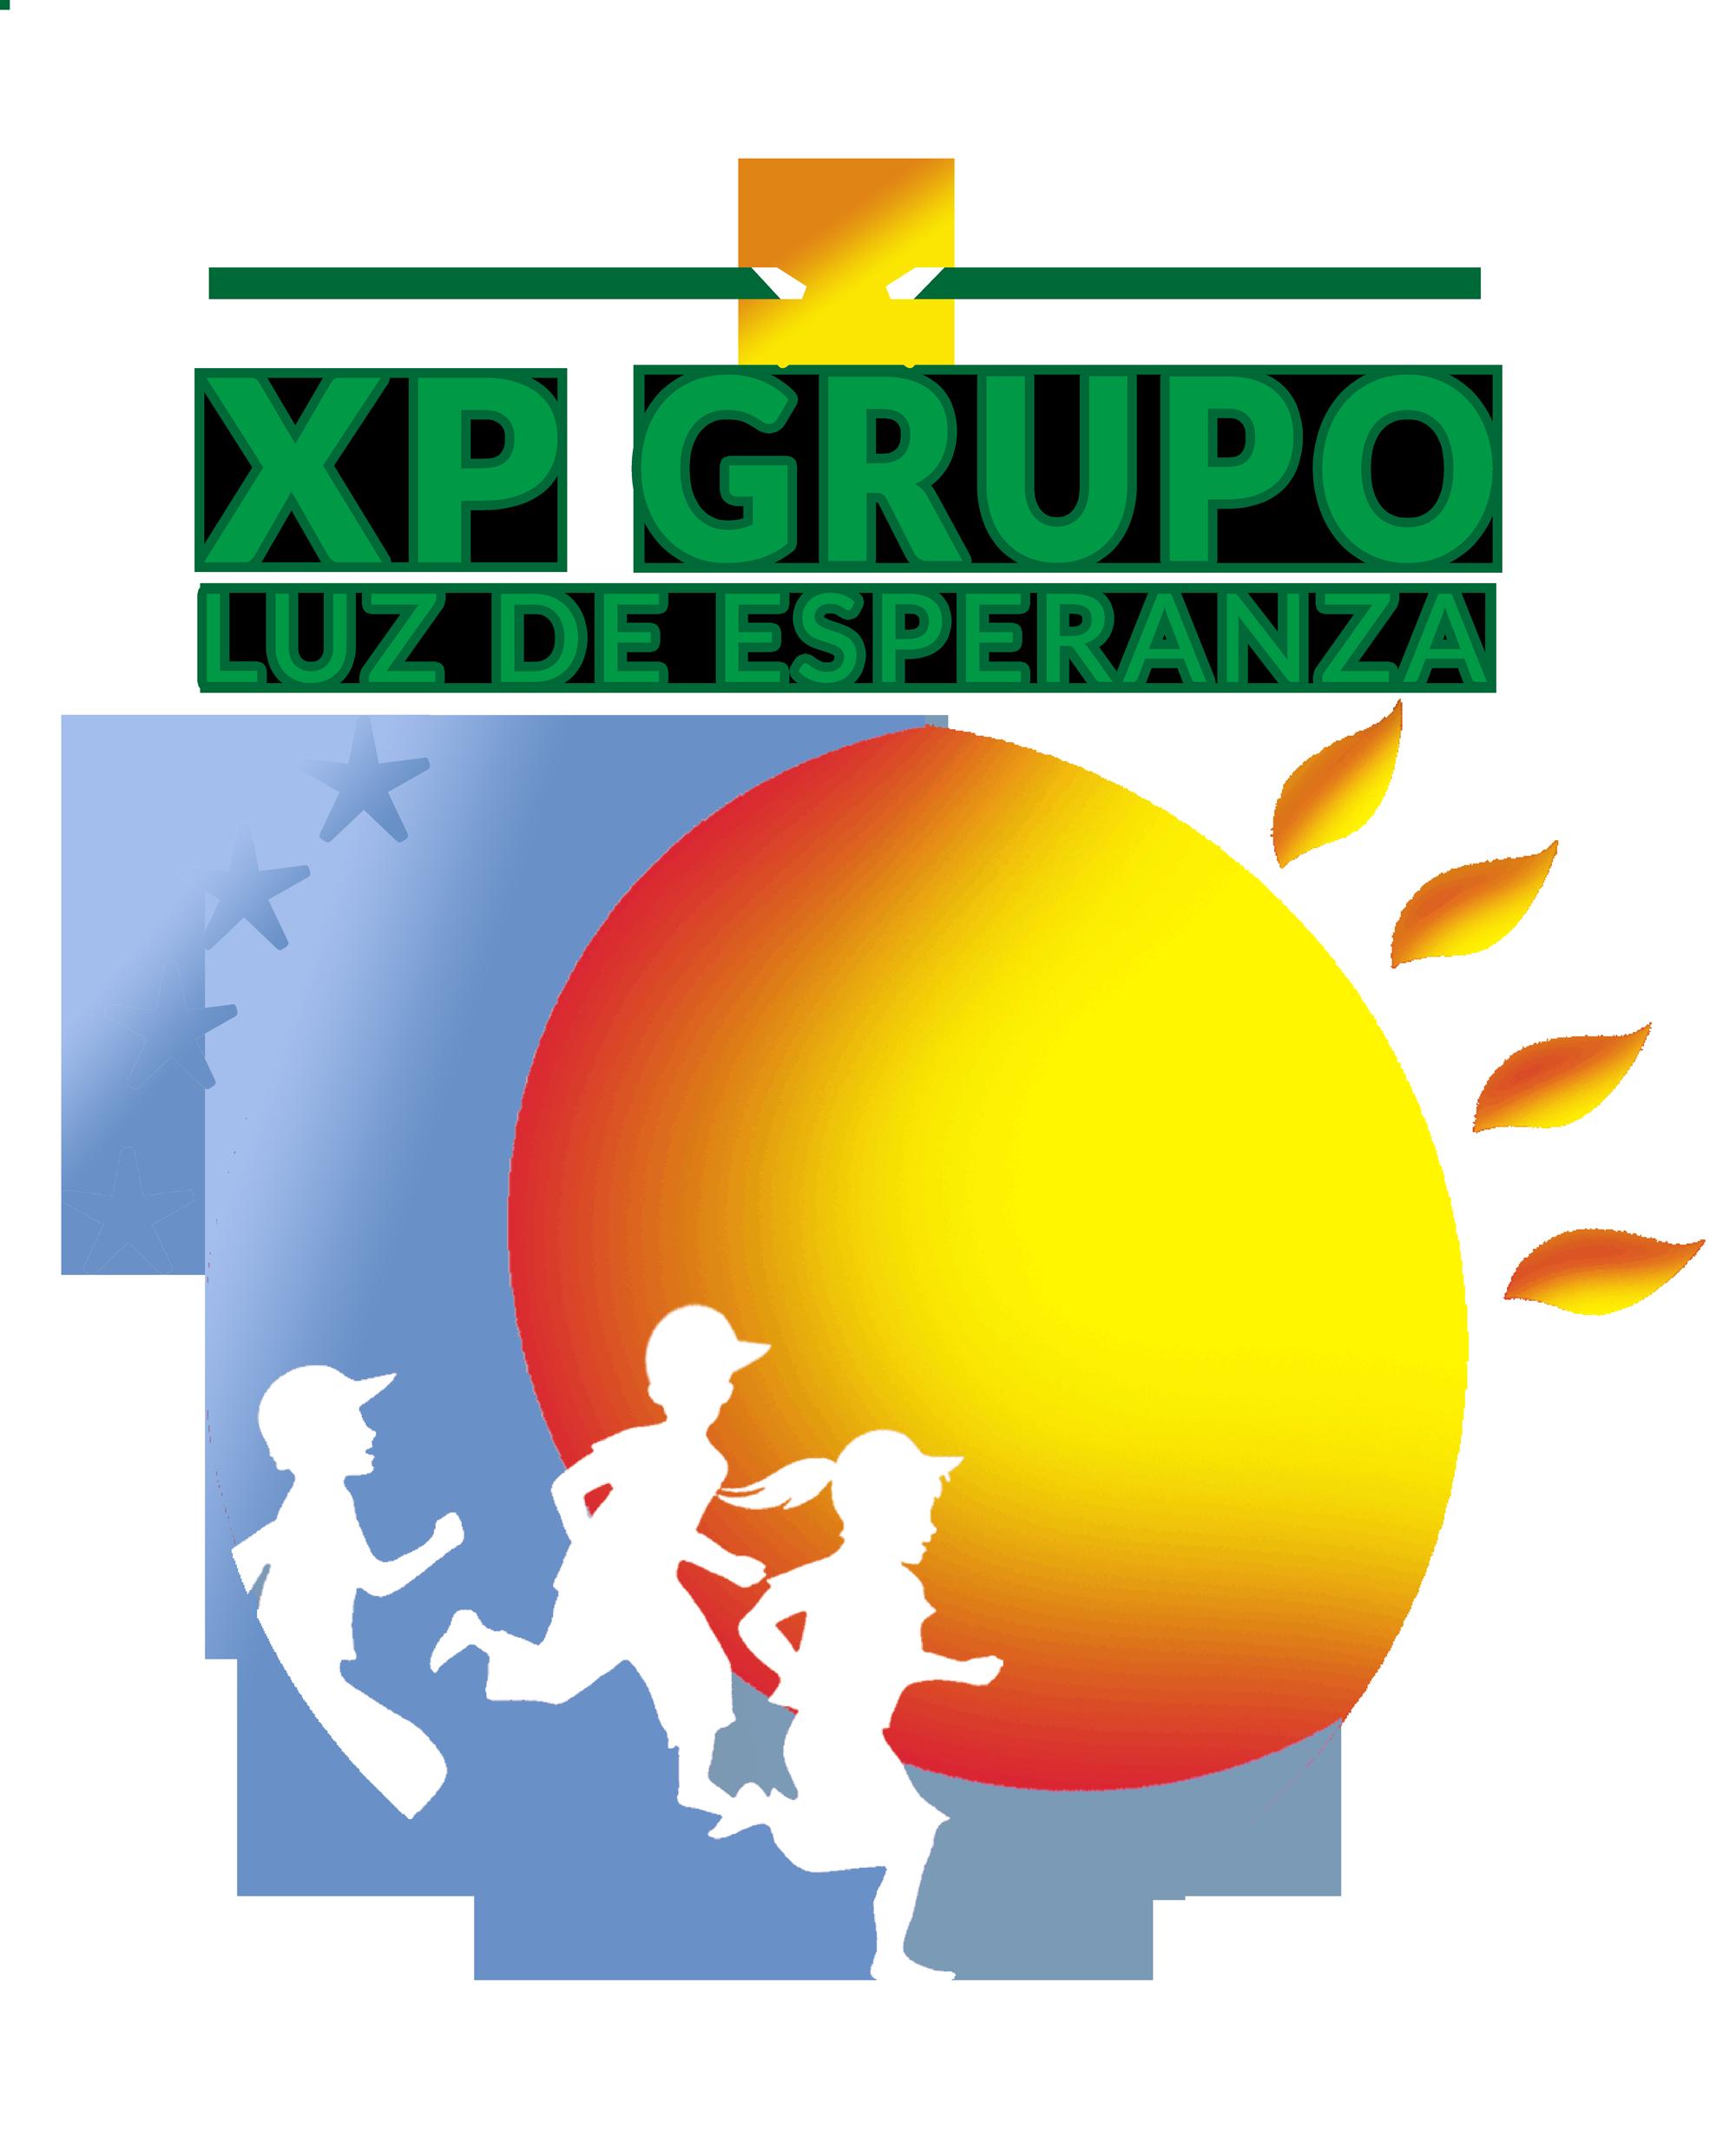 Xp Group